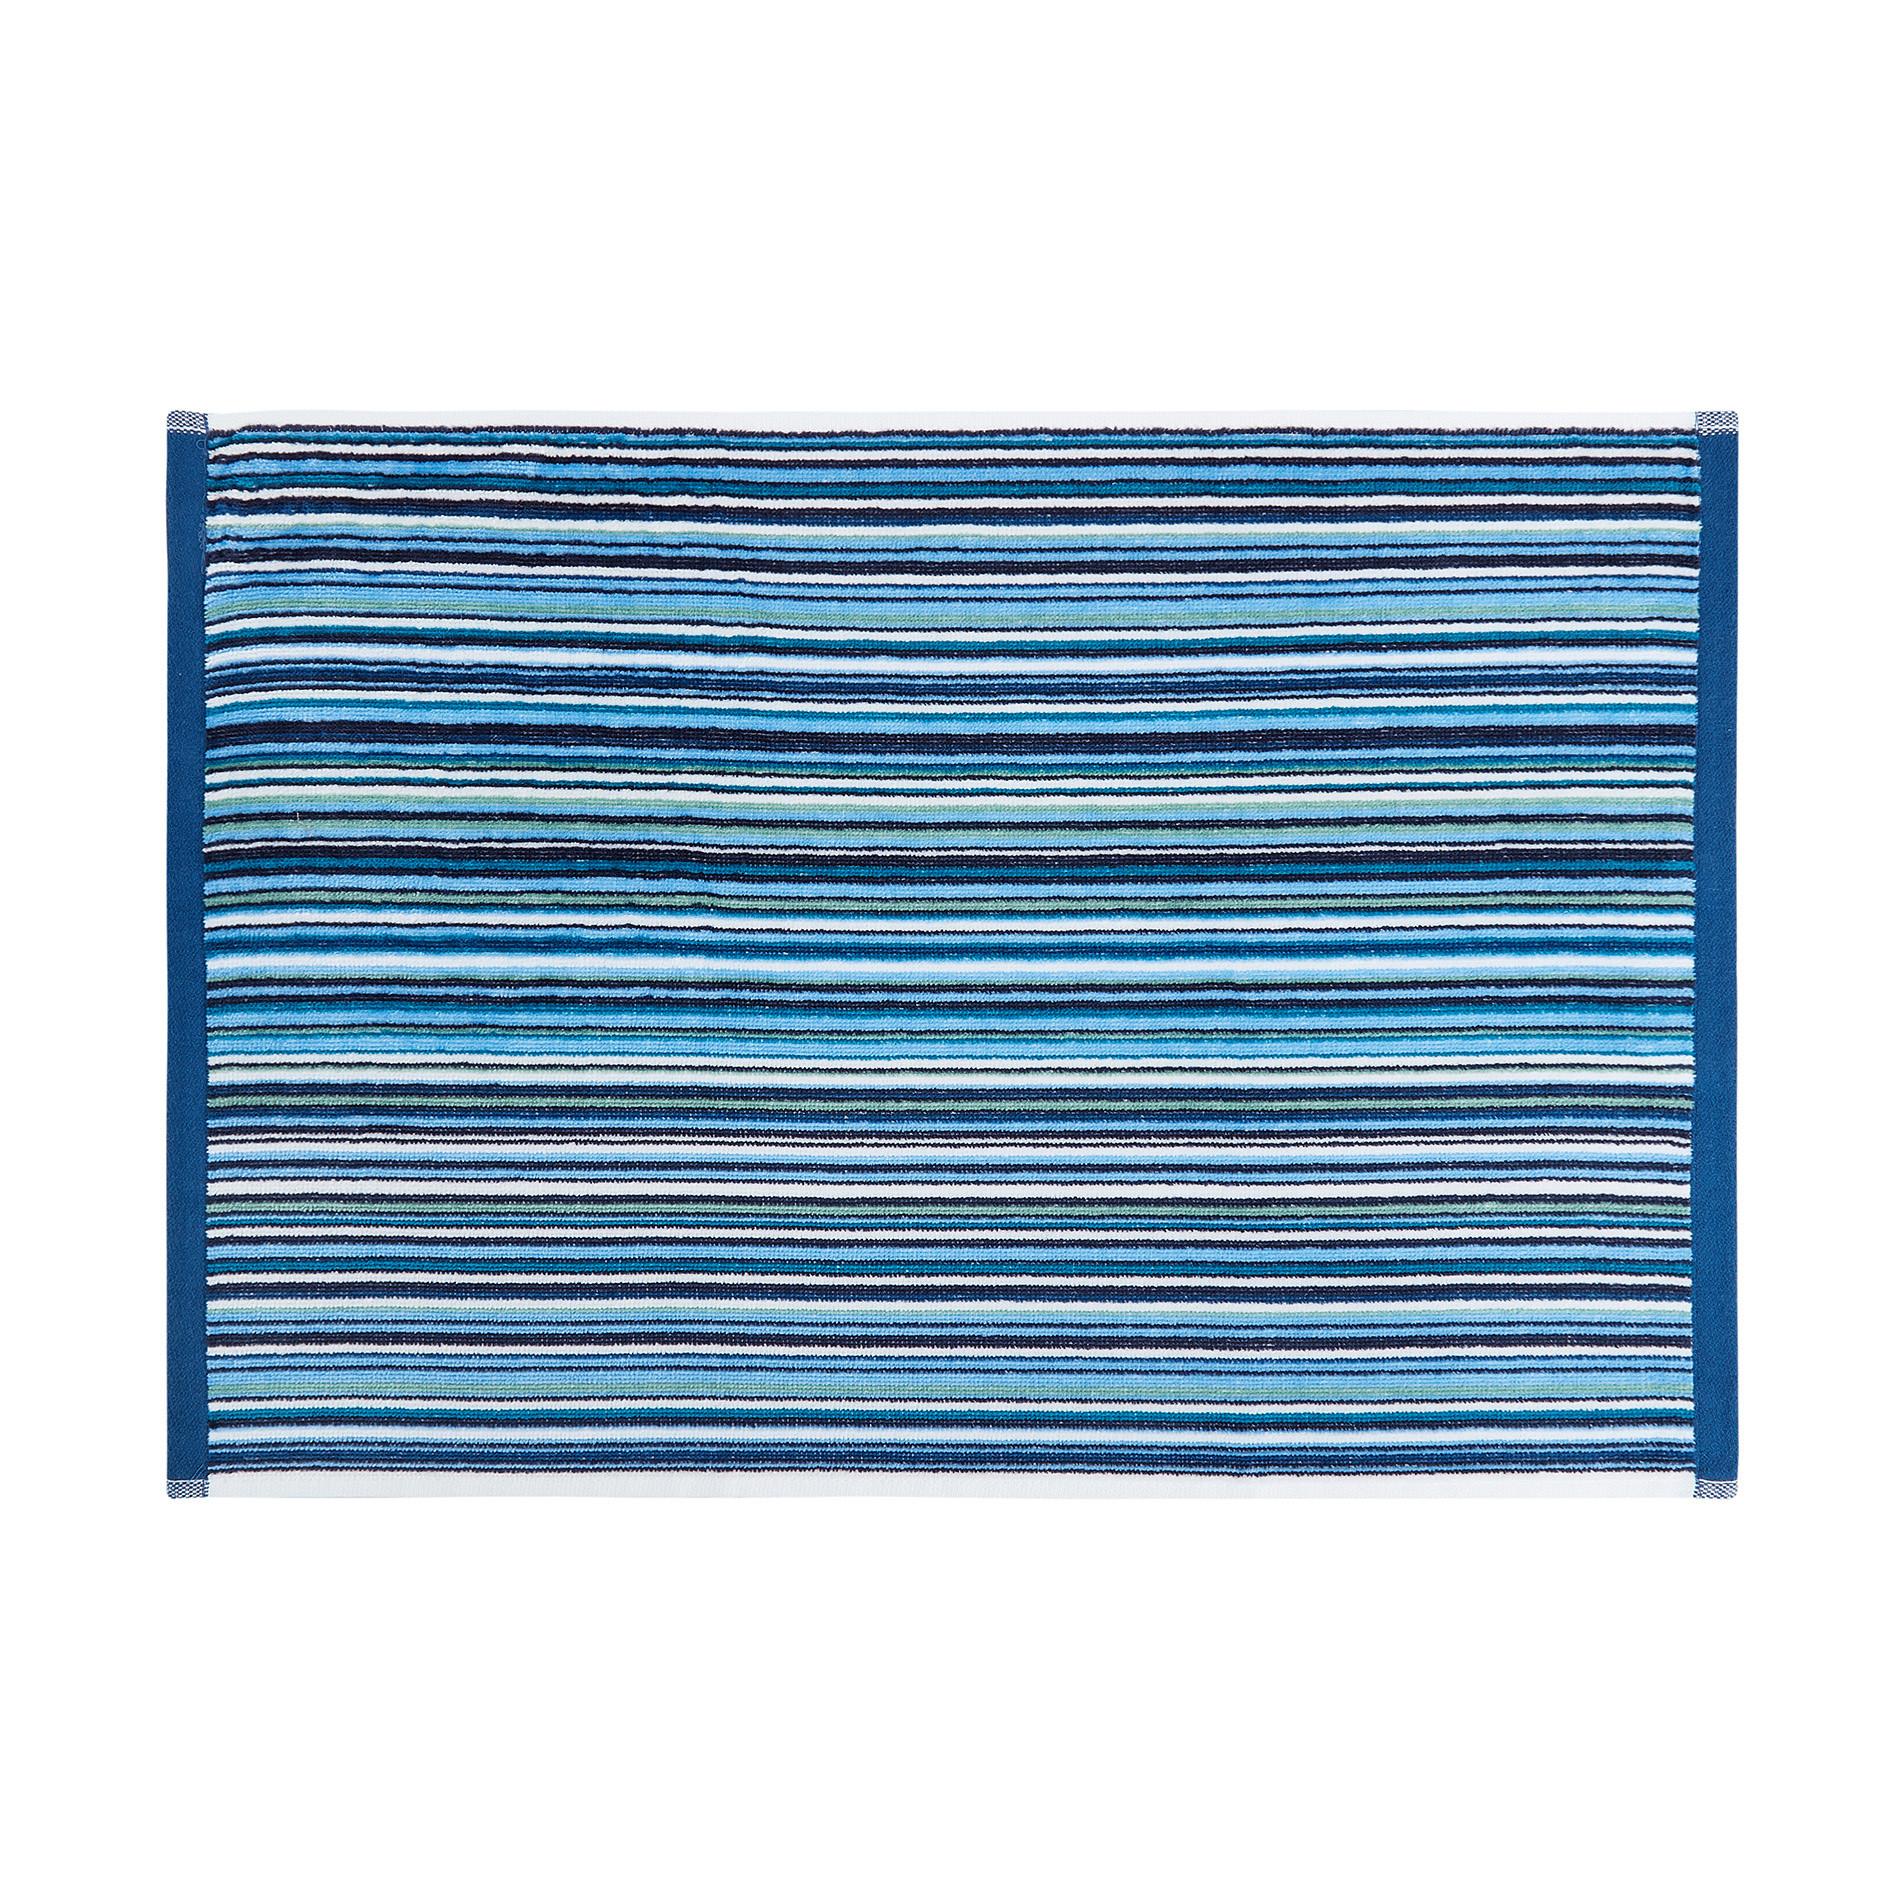 Asciugamano cotone velour fantasia a righe, Blu, large image number 2